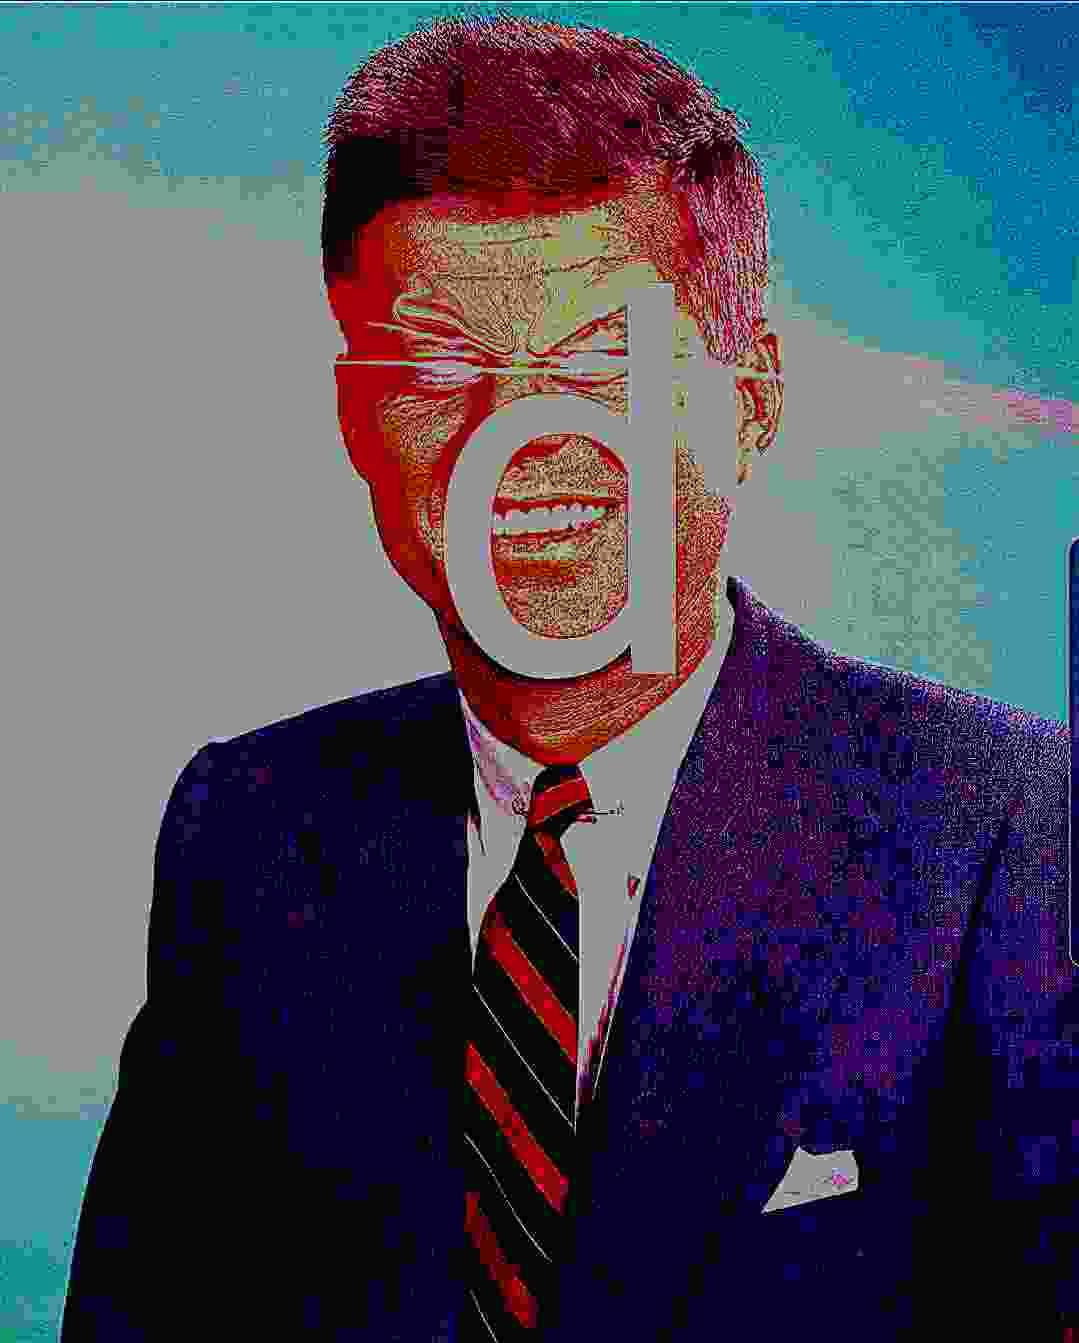 #6 - meme